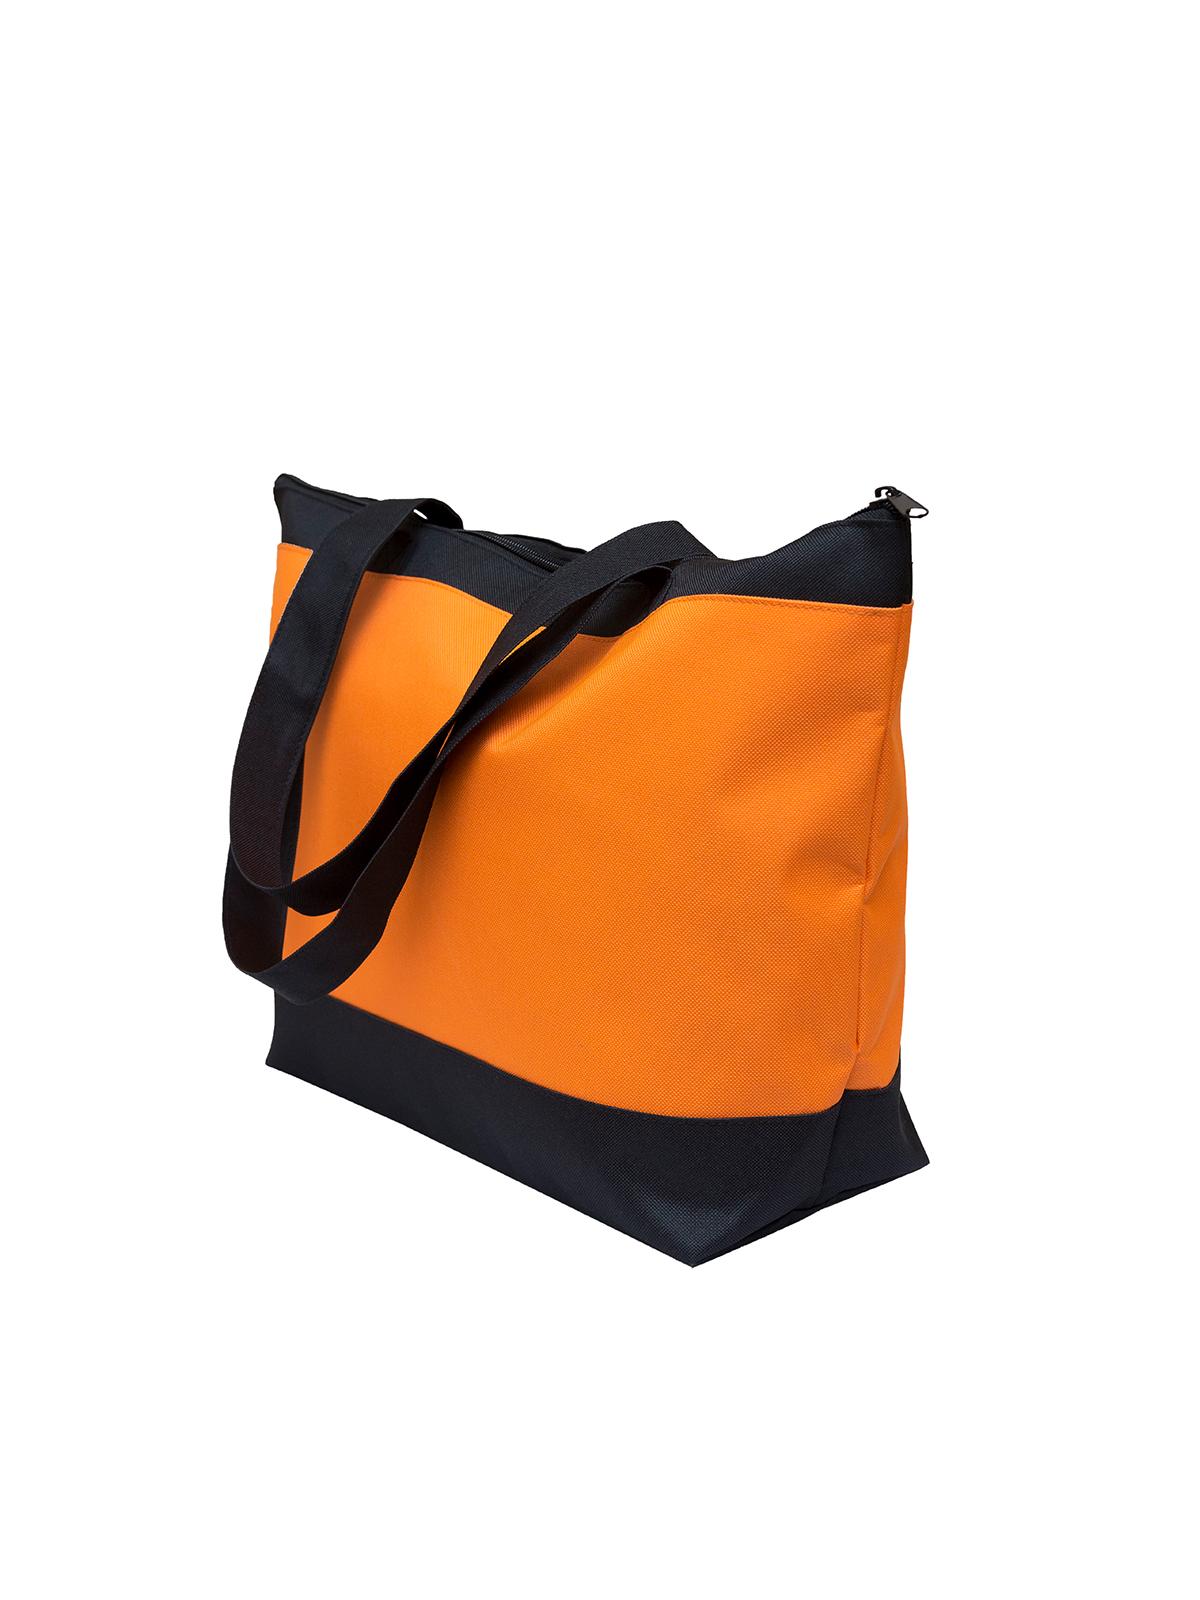 custom nylon tote bag